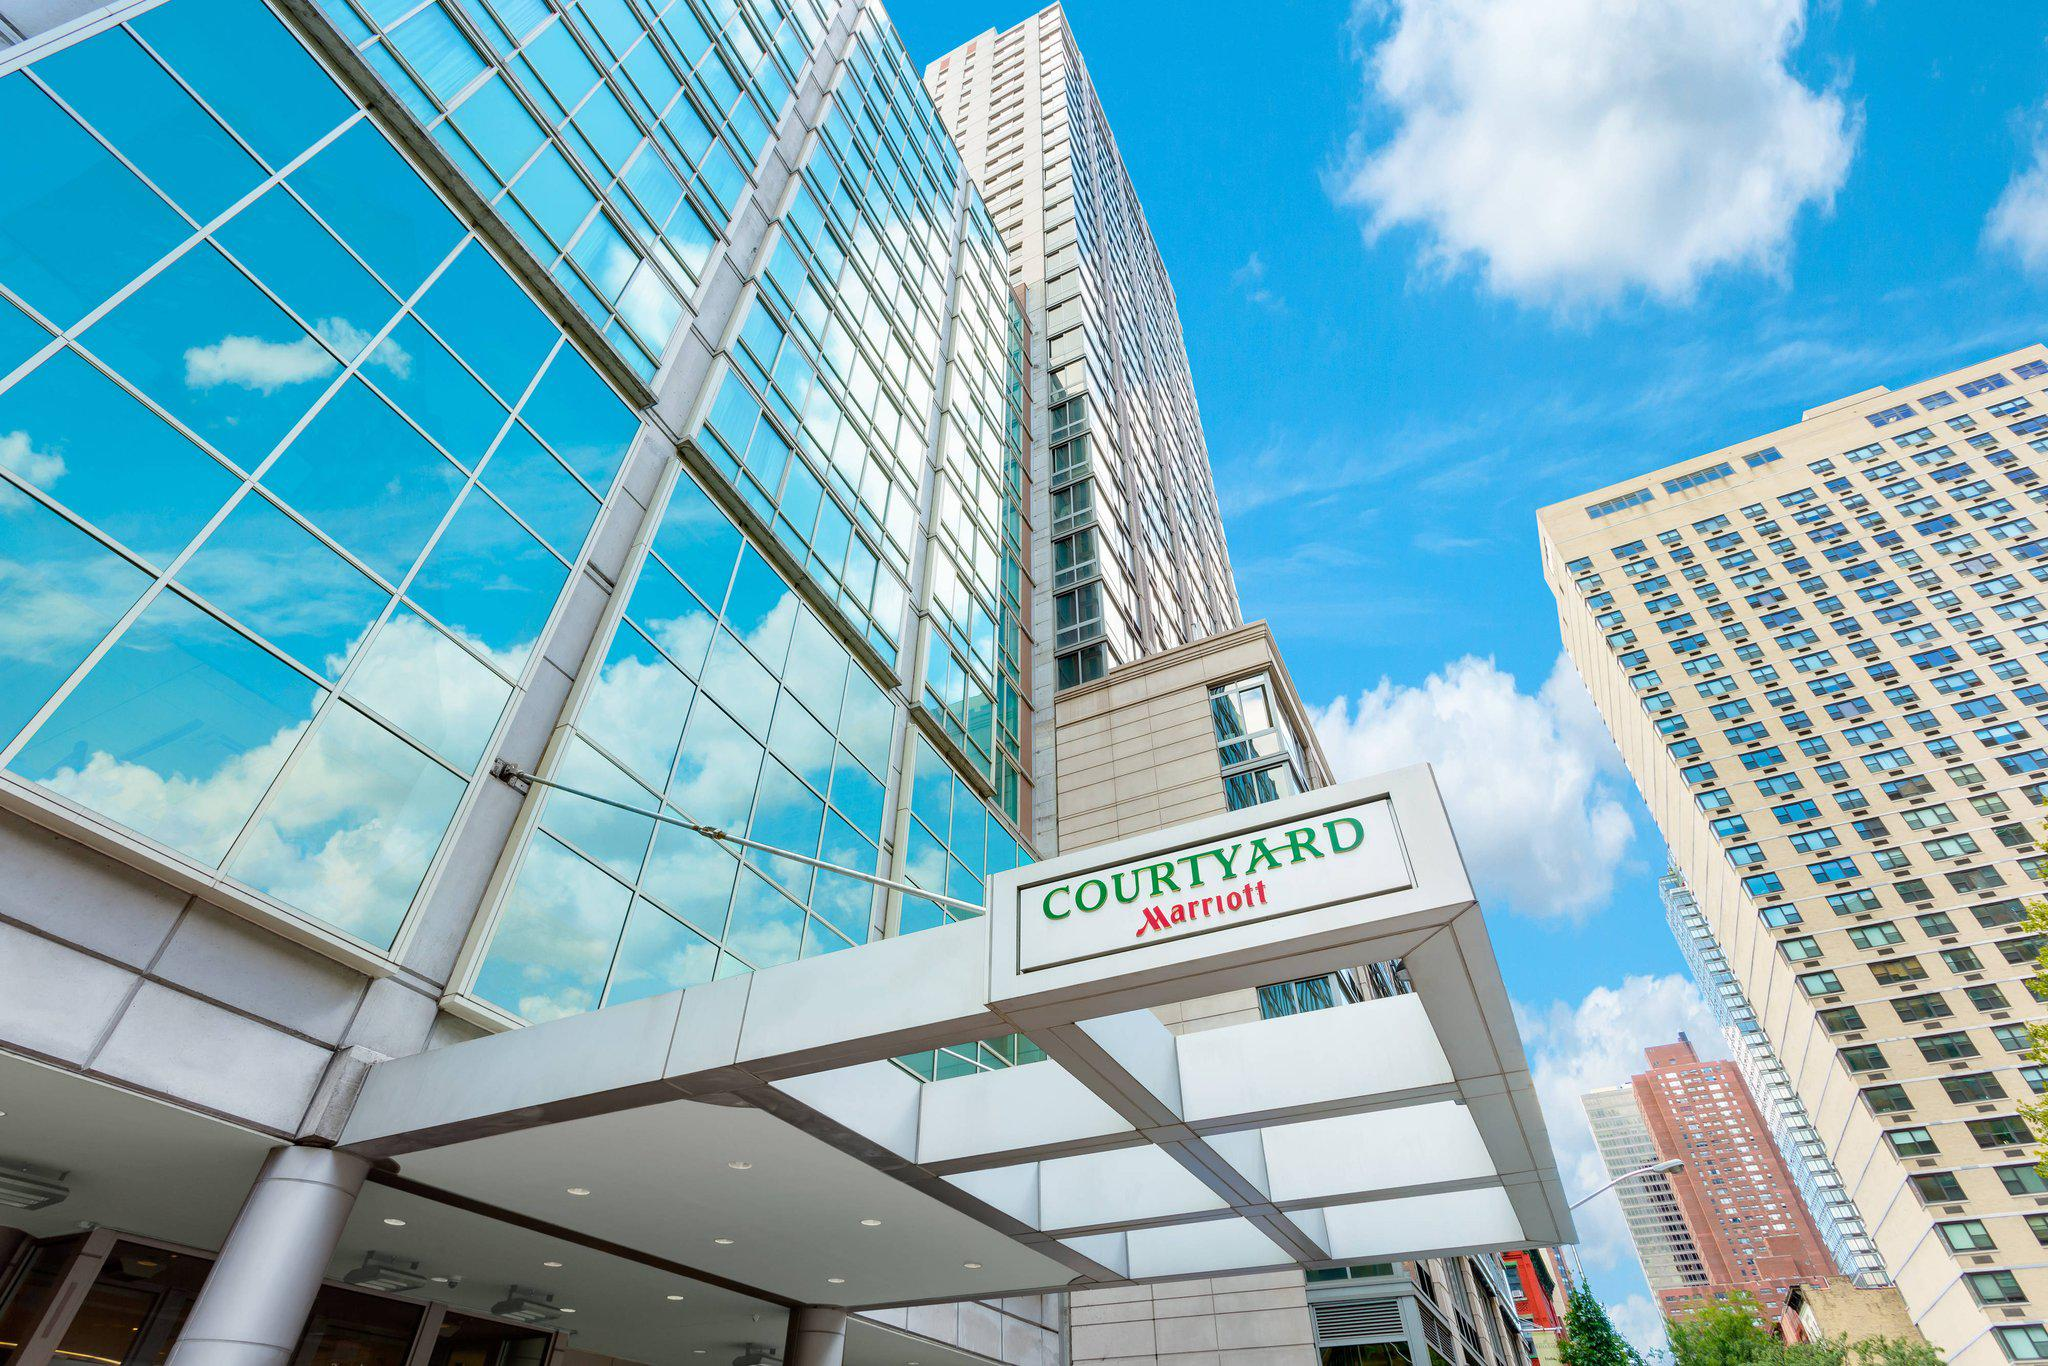 Courtyard by Marriott New York Manhattan/Upper East Side